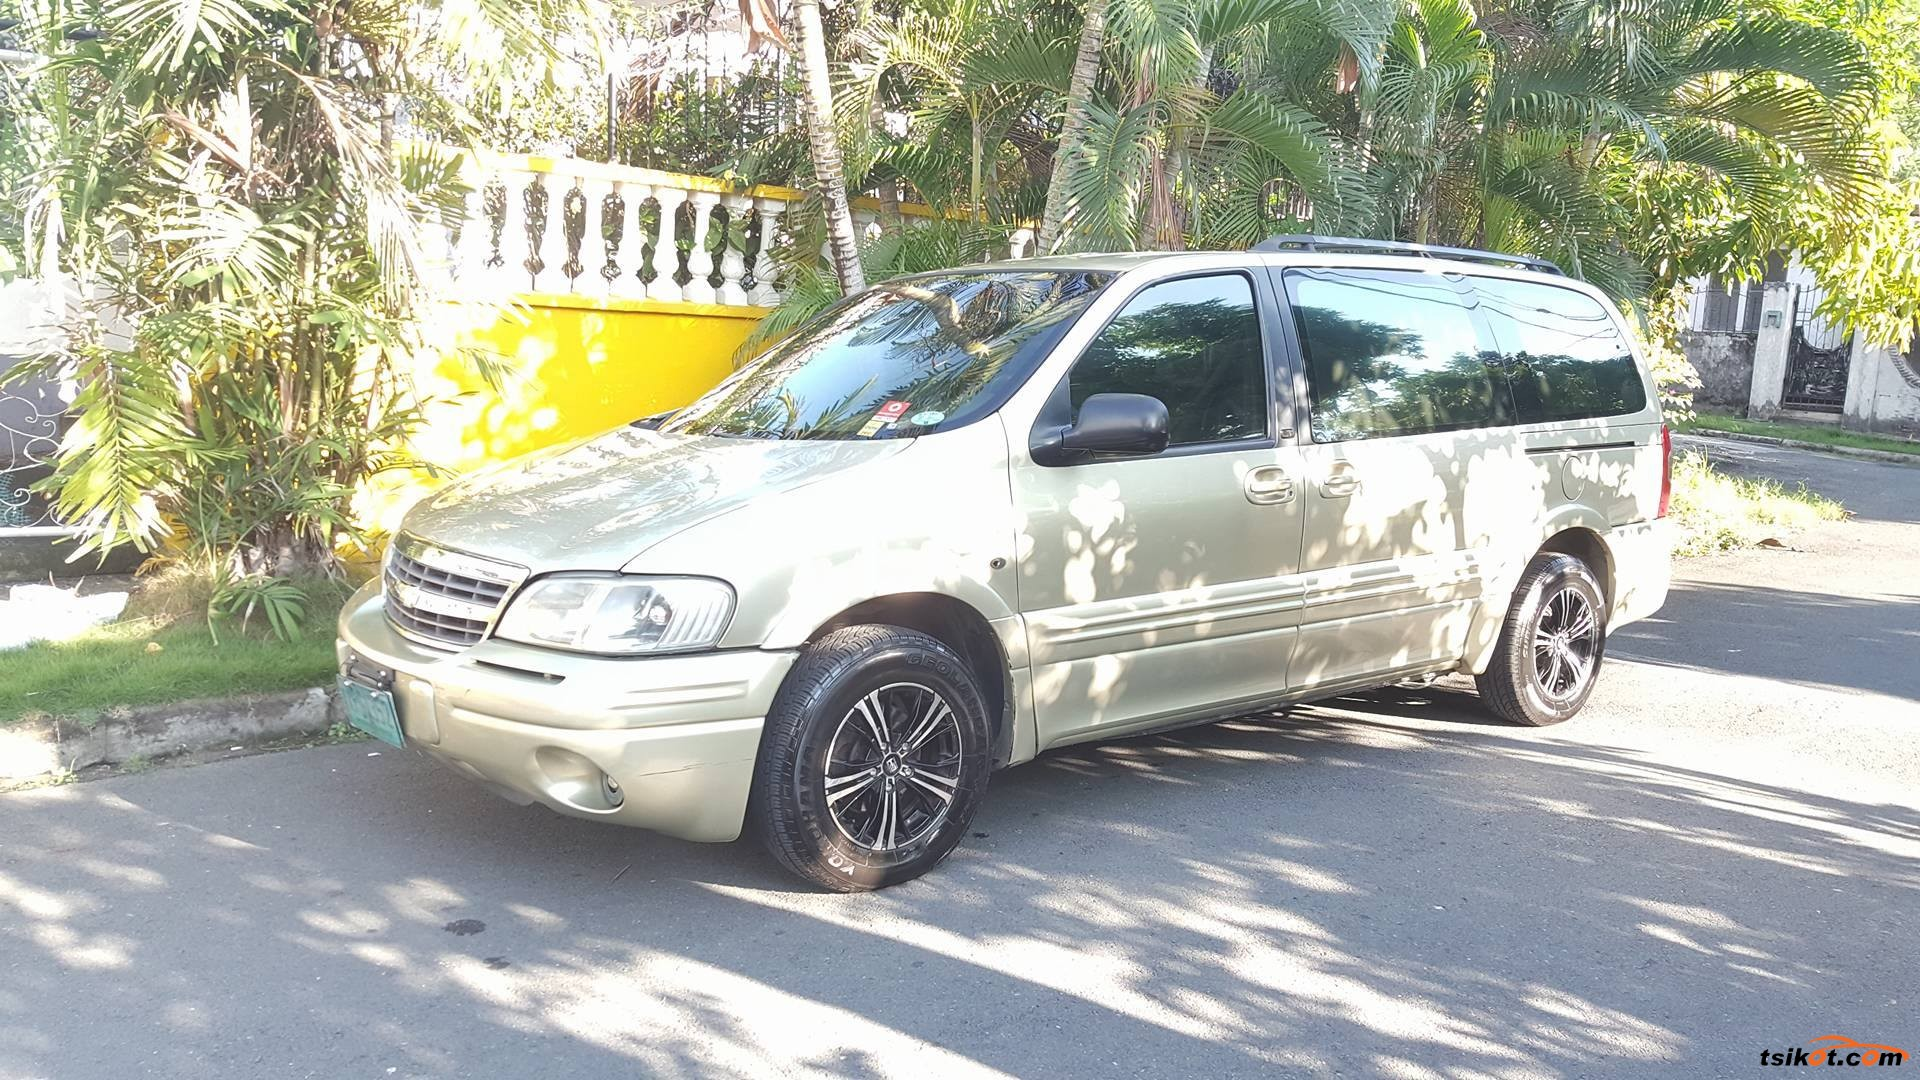 Chevrolet Venture 2004 - 4